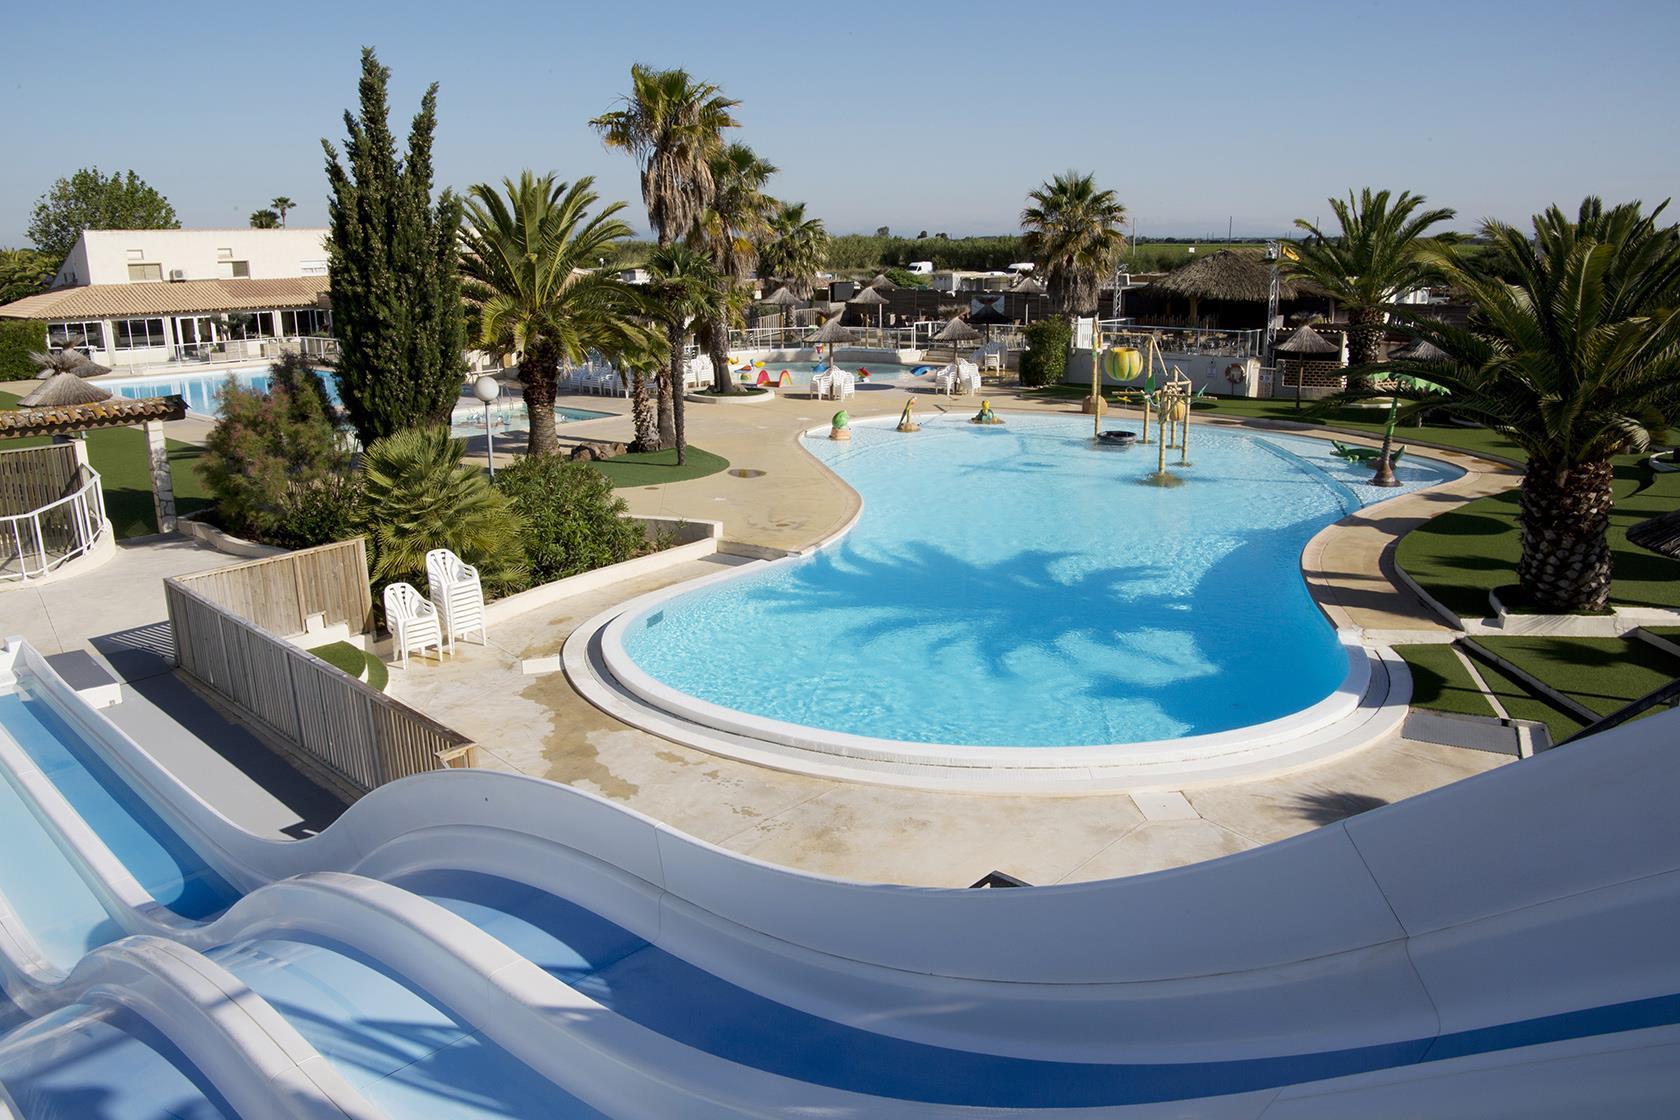 Children pool Slides Pool area Palm trees